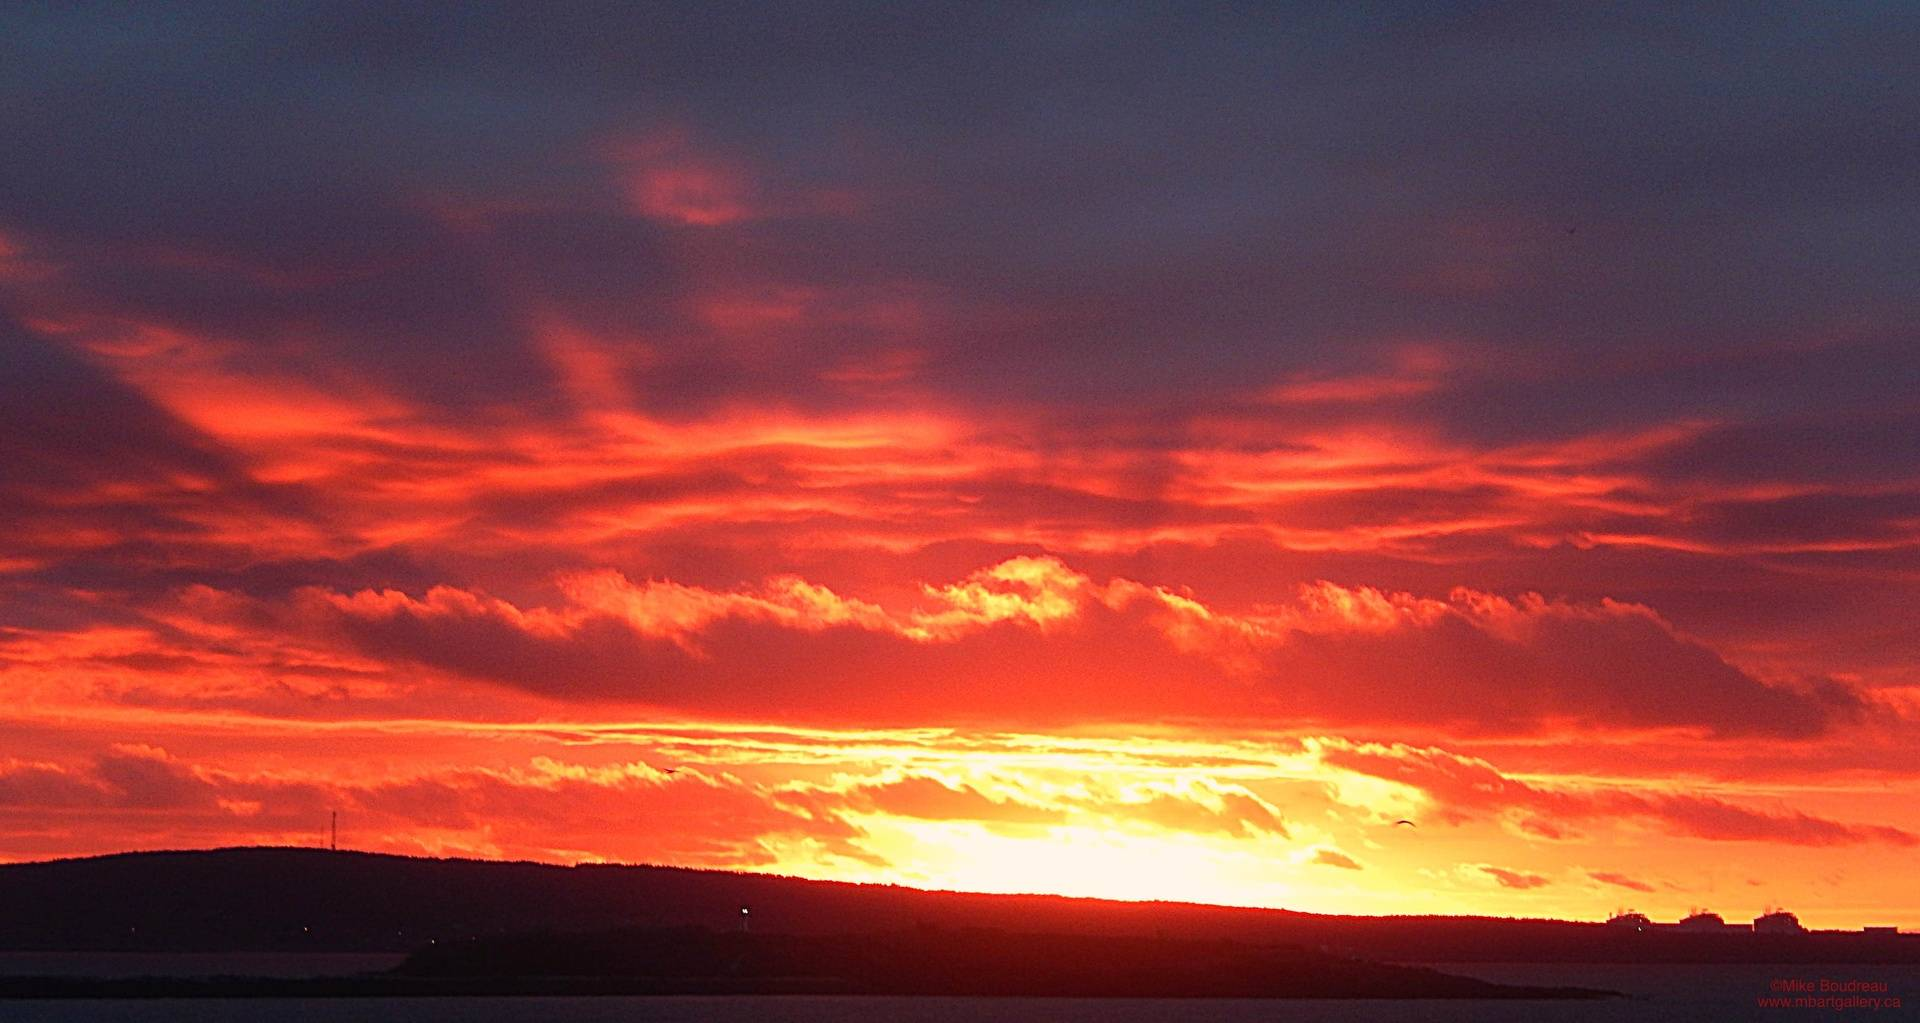 Early Sunrise over Partridge Island, Saint John NB